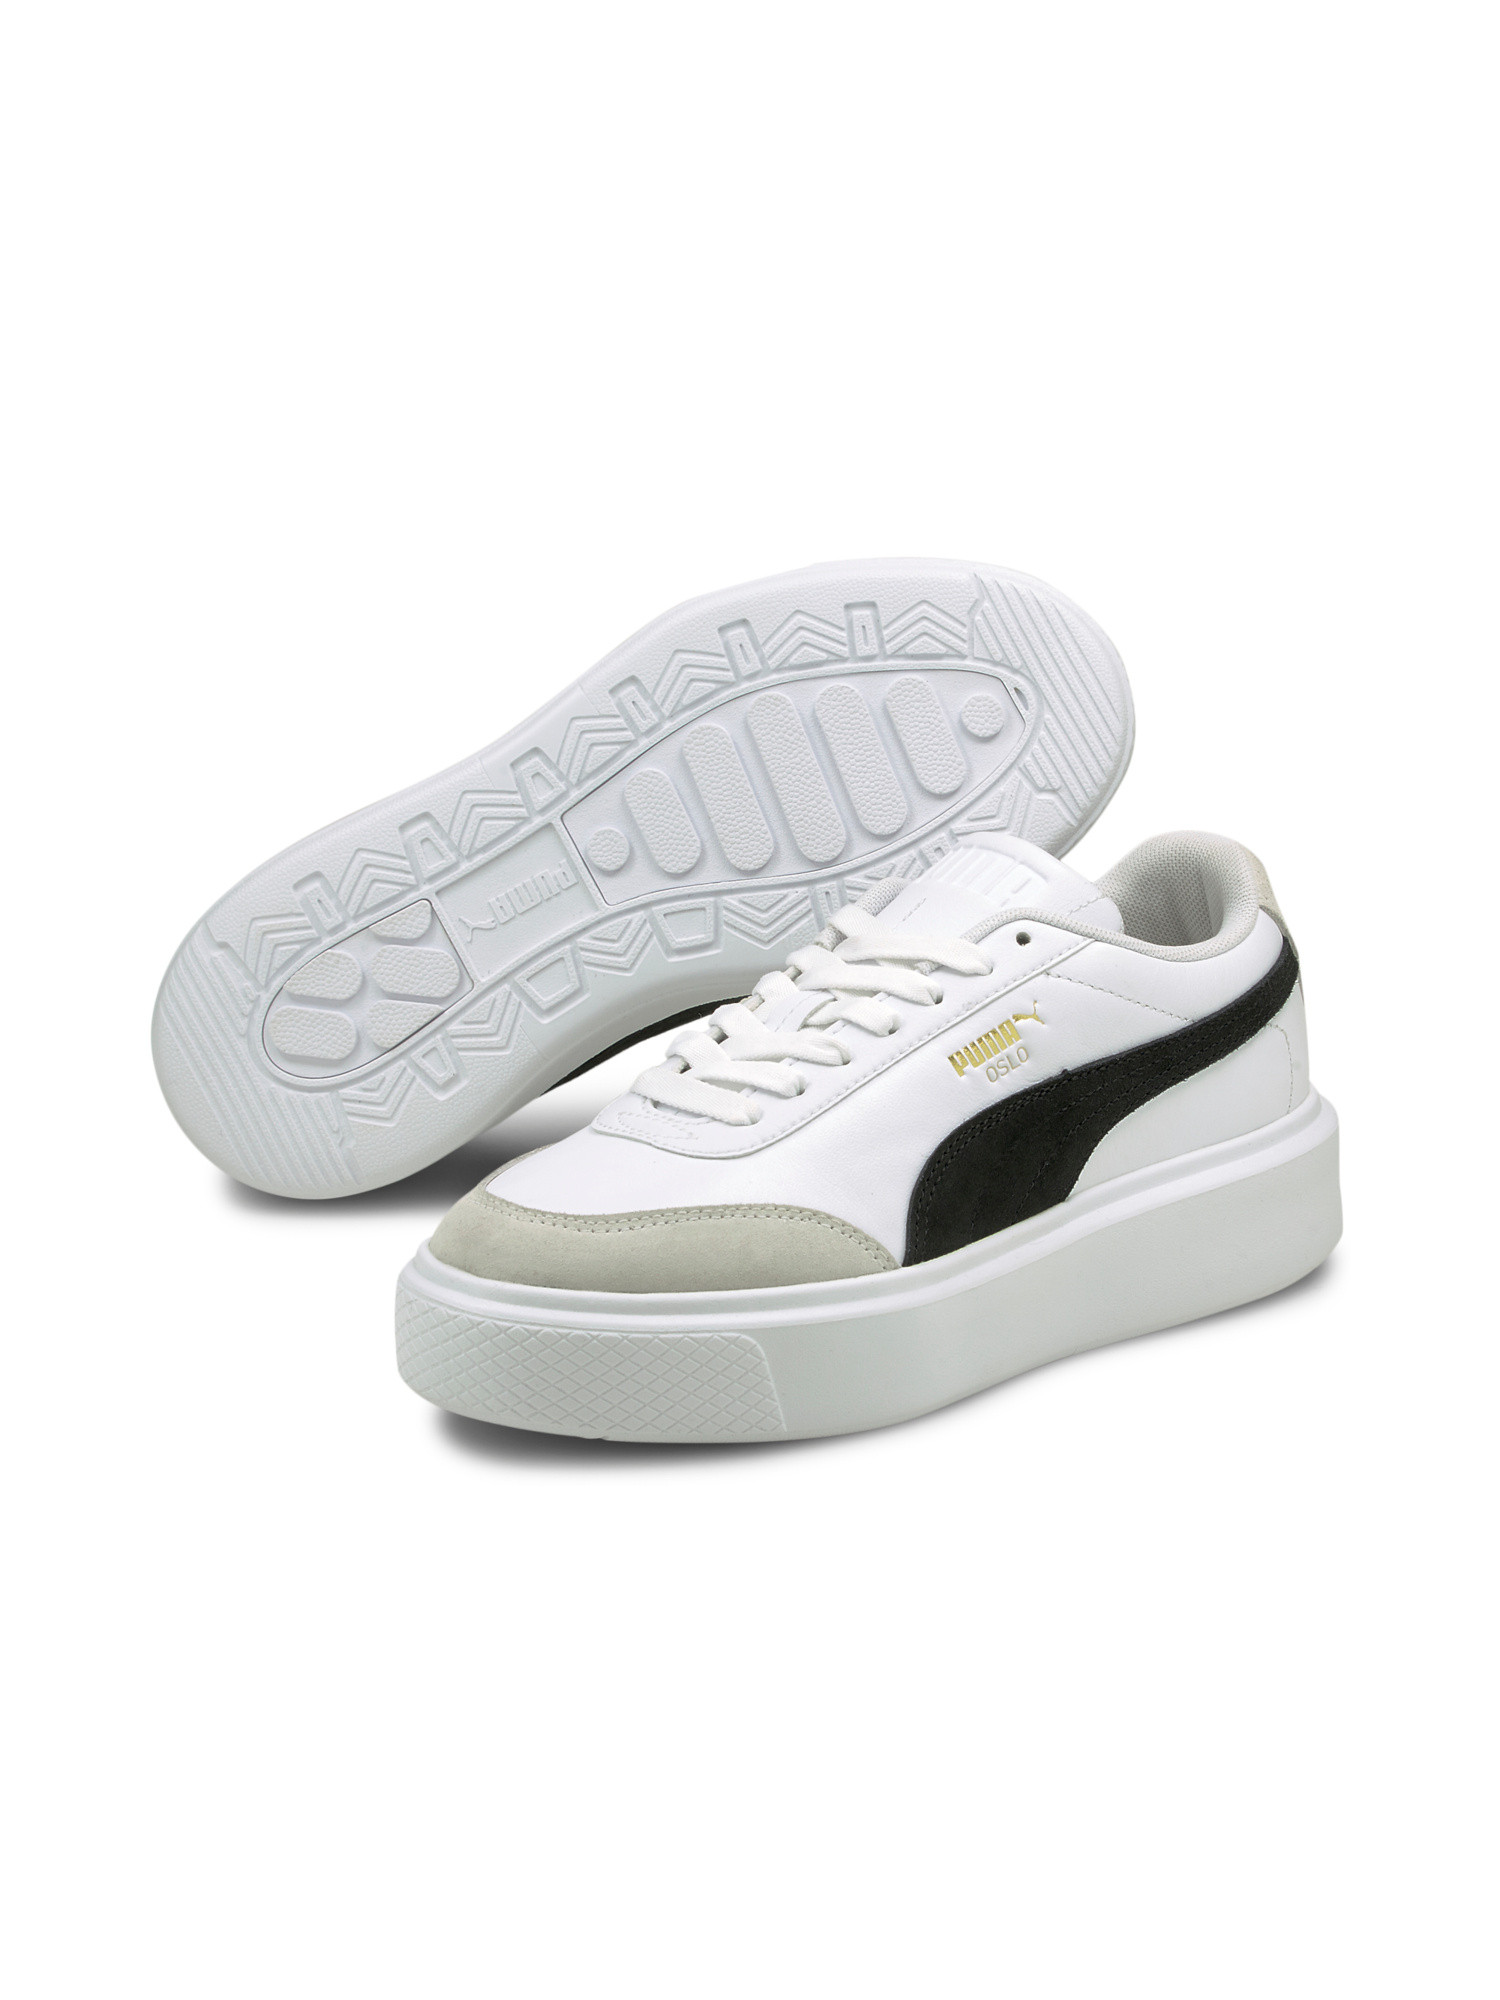 Sneakers Oslo Maya, Nero/Bianco, large image number 5